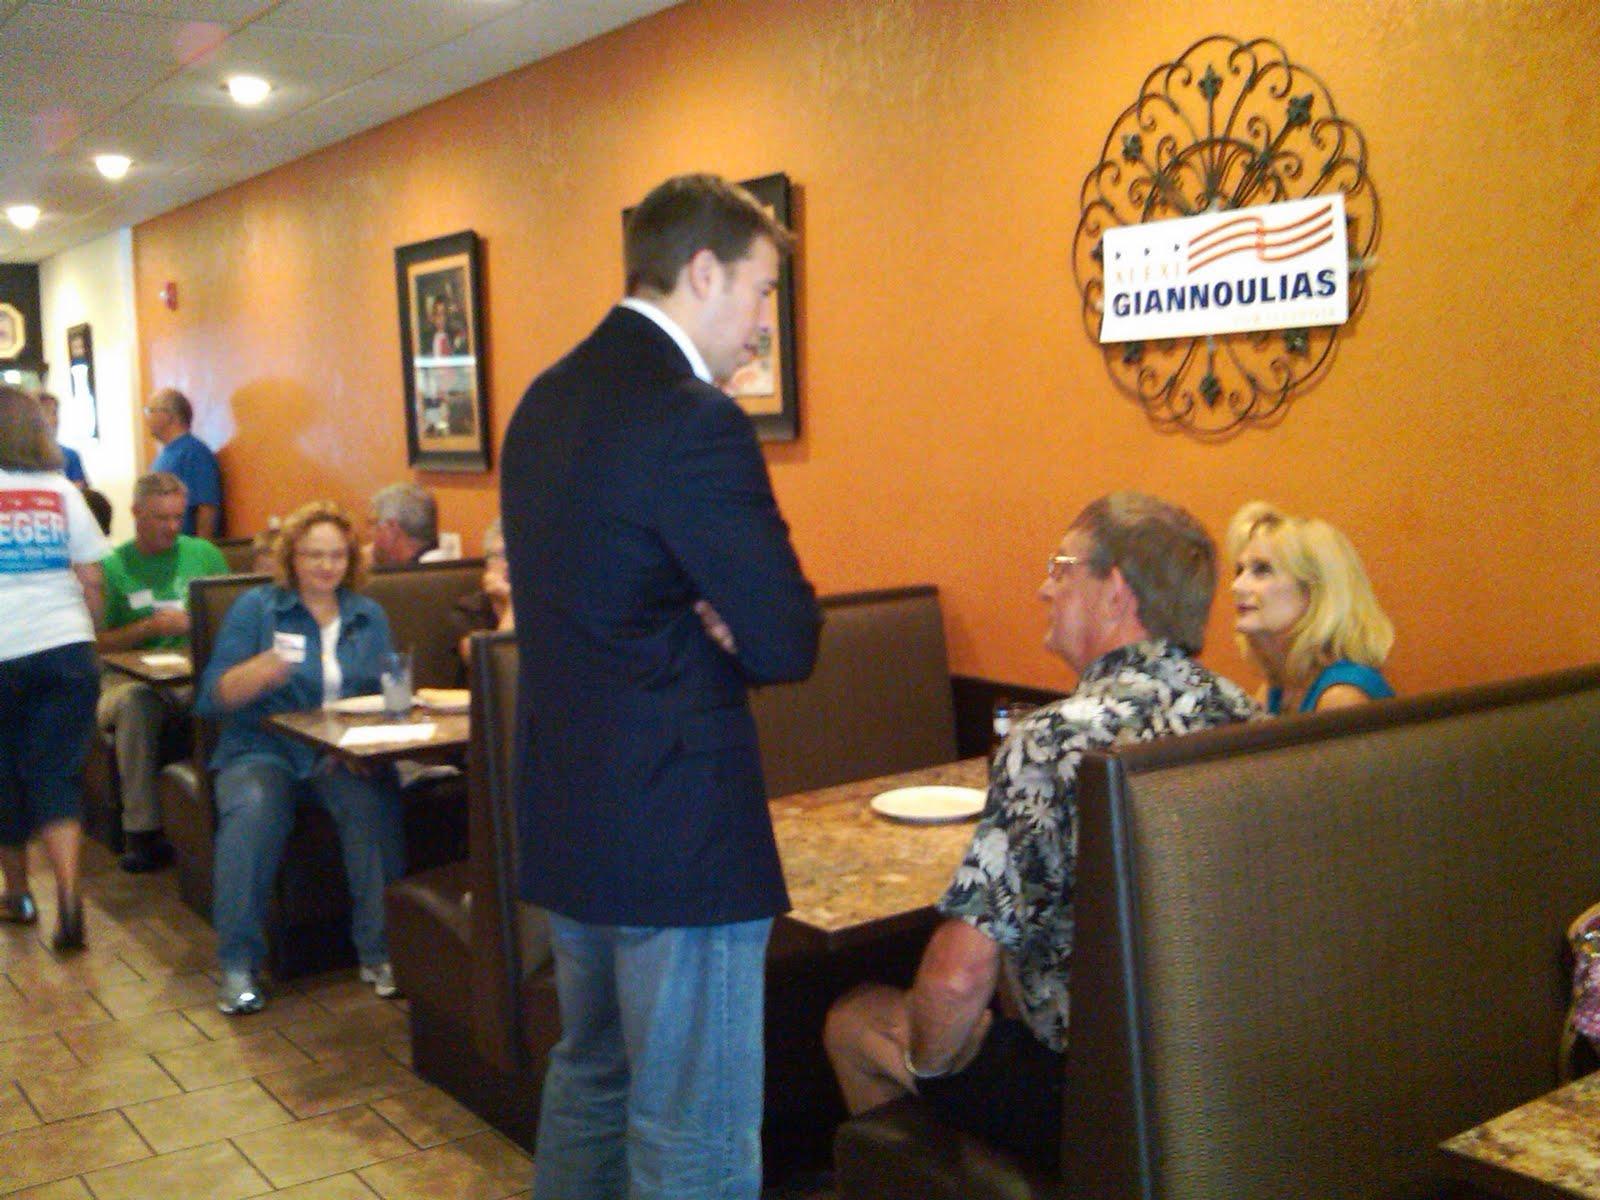 Illinois effingham county teutopolis - Alexi At Joe S Pizza In Effingham